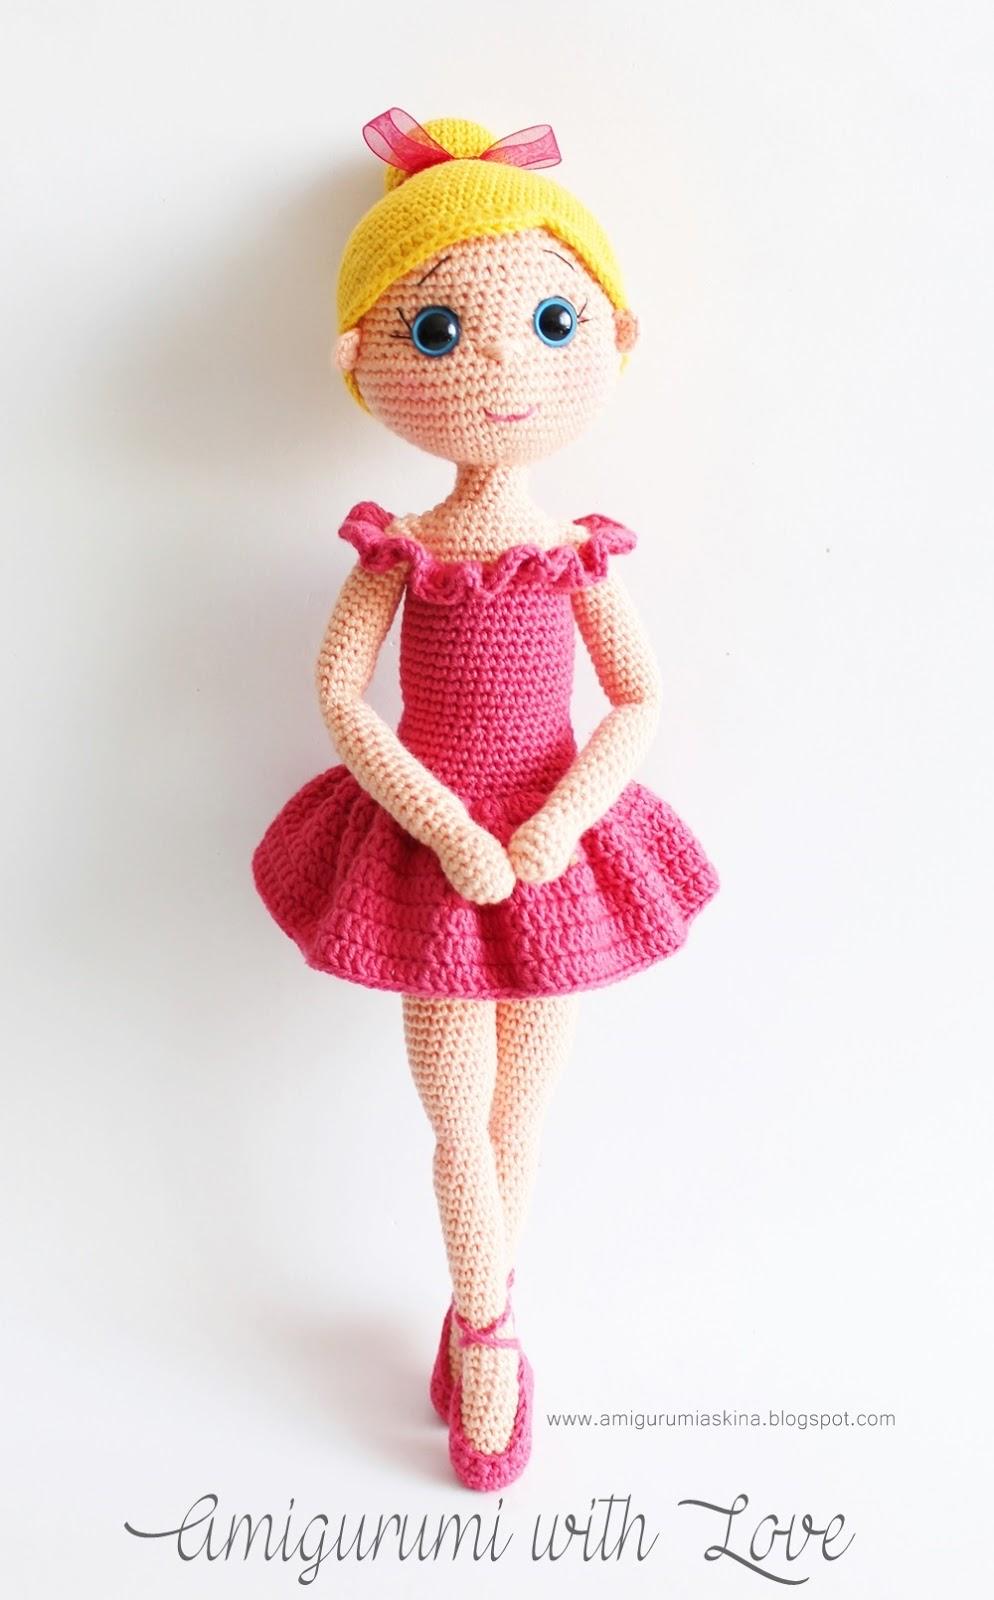 Deadpool Amigurumi Free Pattern : Amigurumi Balerin Bebek- Amigurumi Ballerina Doll - Tiny ...